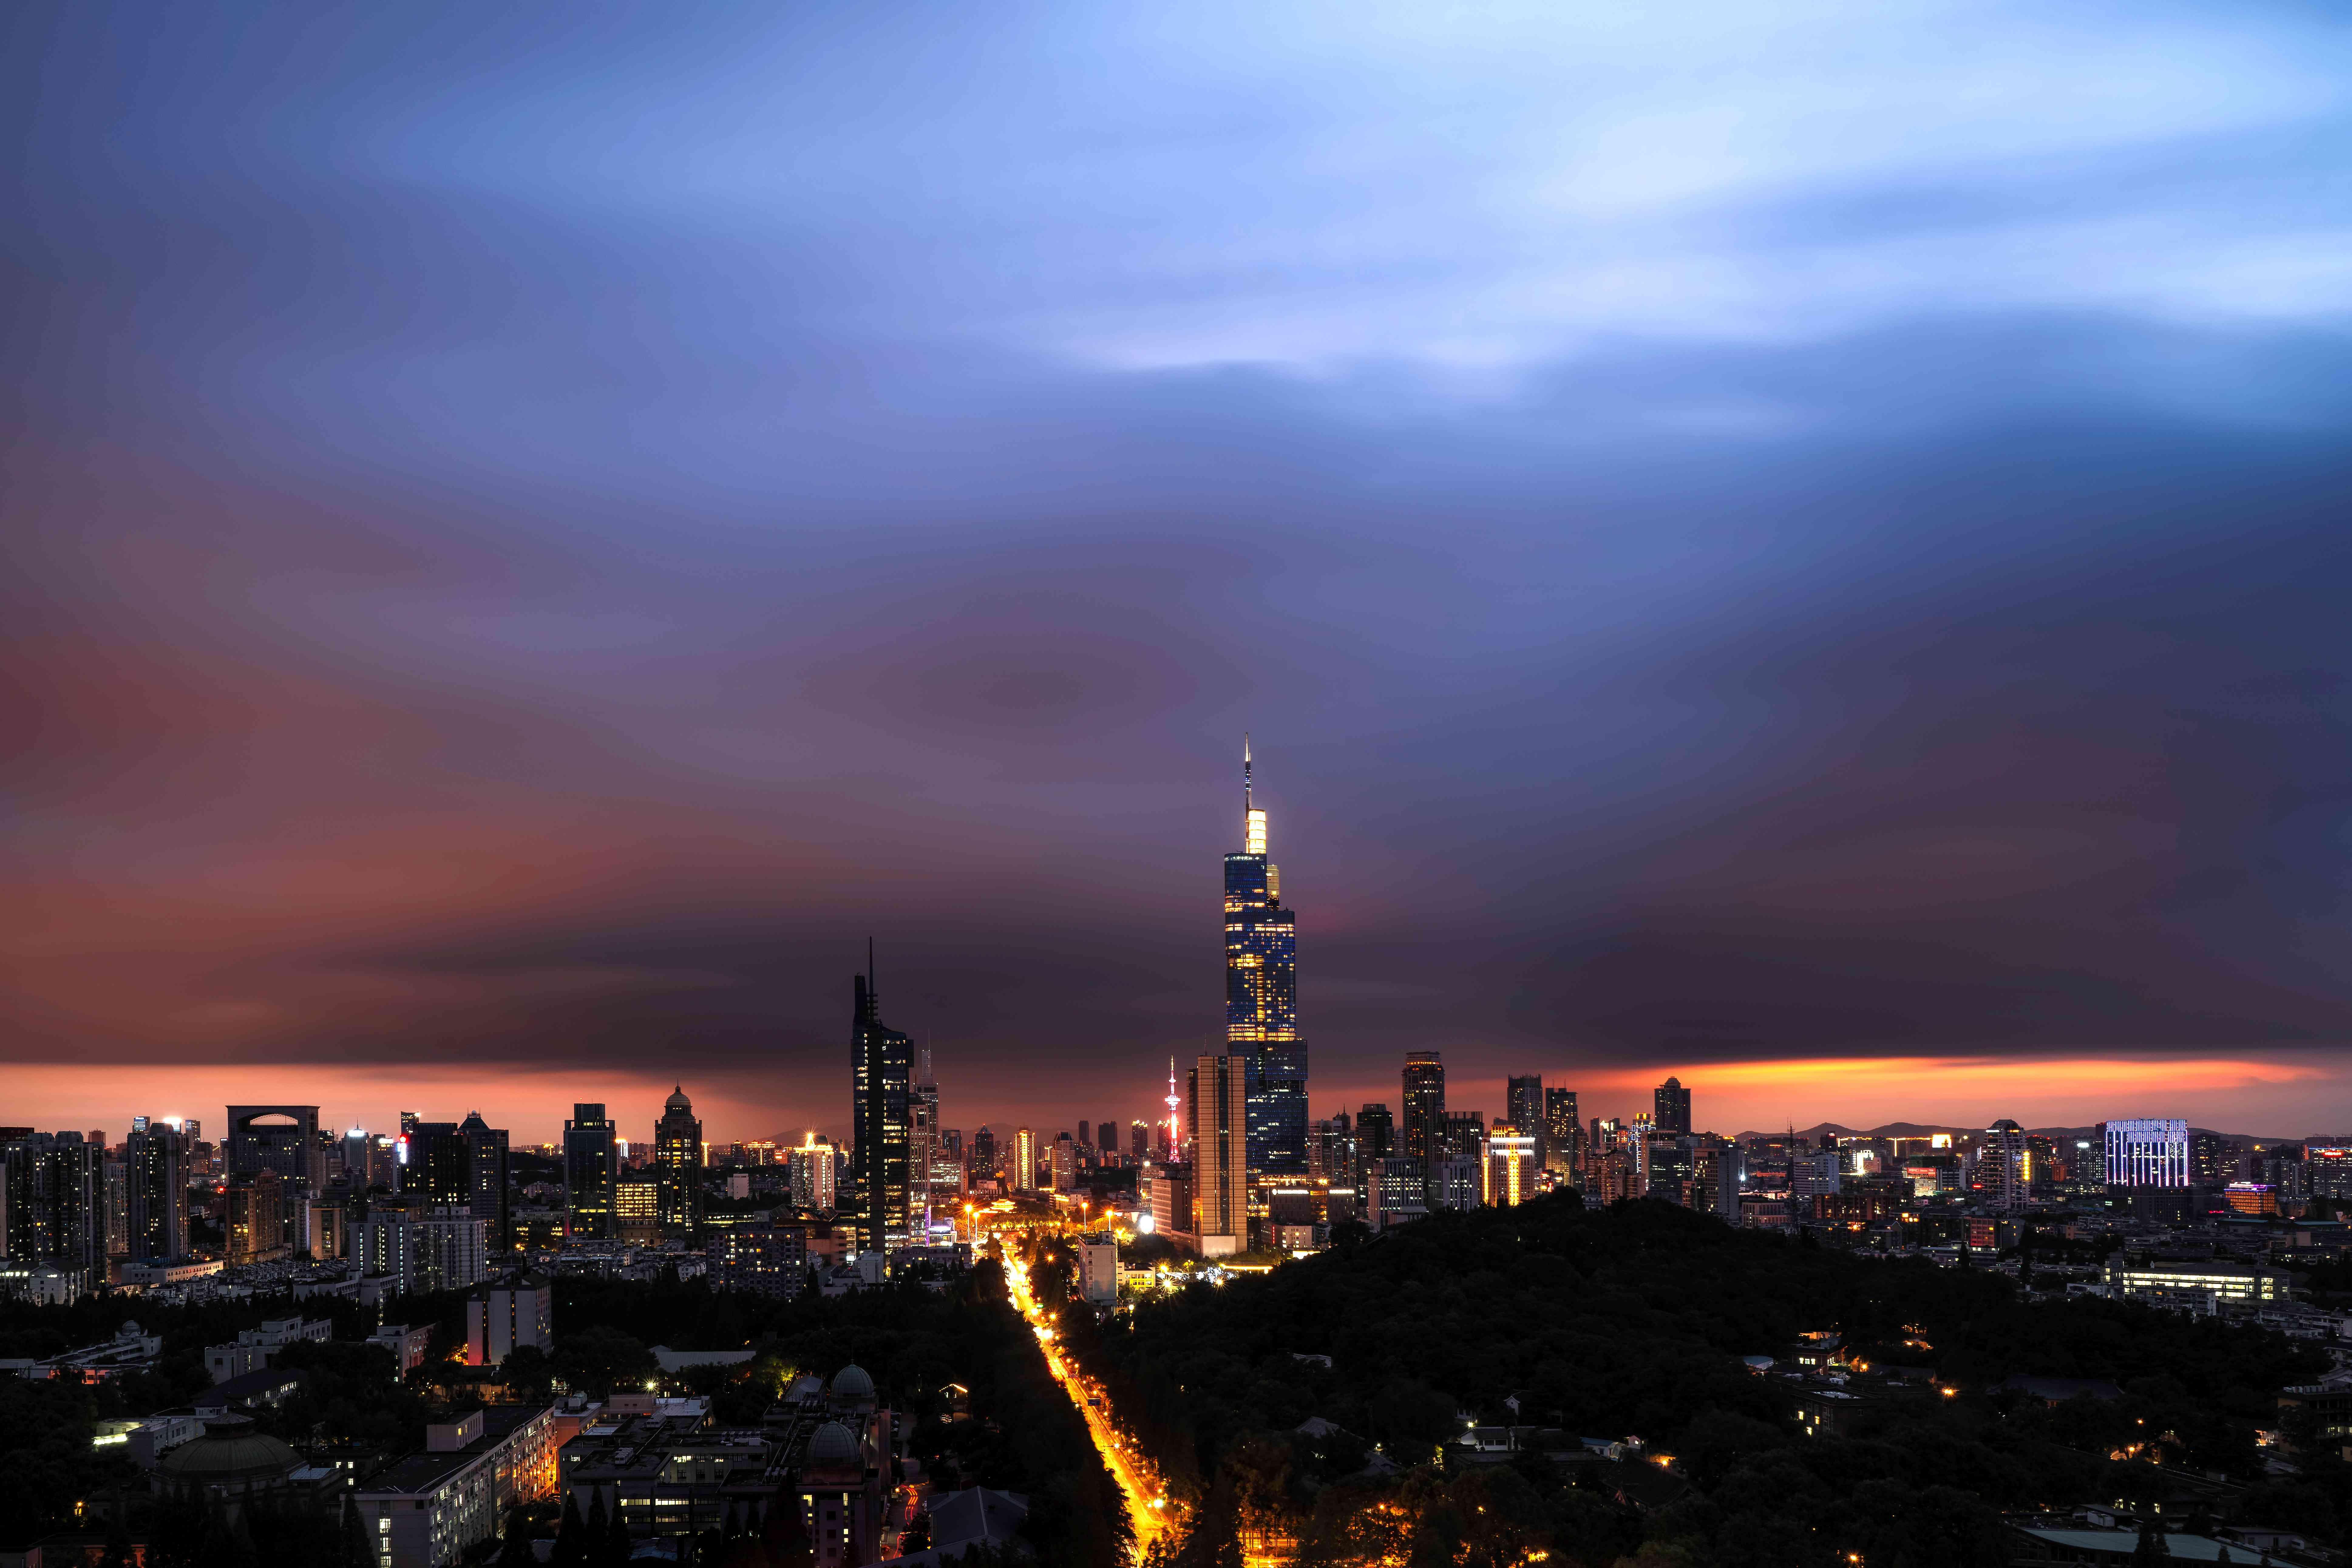 Jiangsu's capital, Nanjing, surrounded by the dark clouds of a typhoon